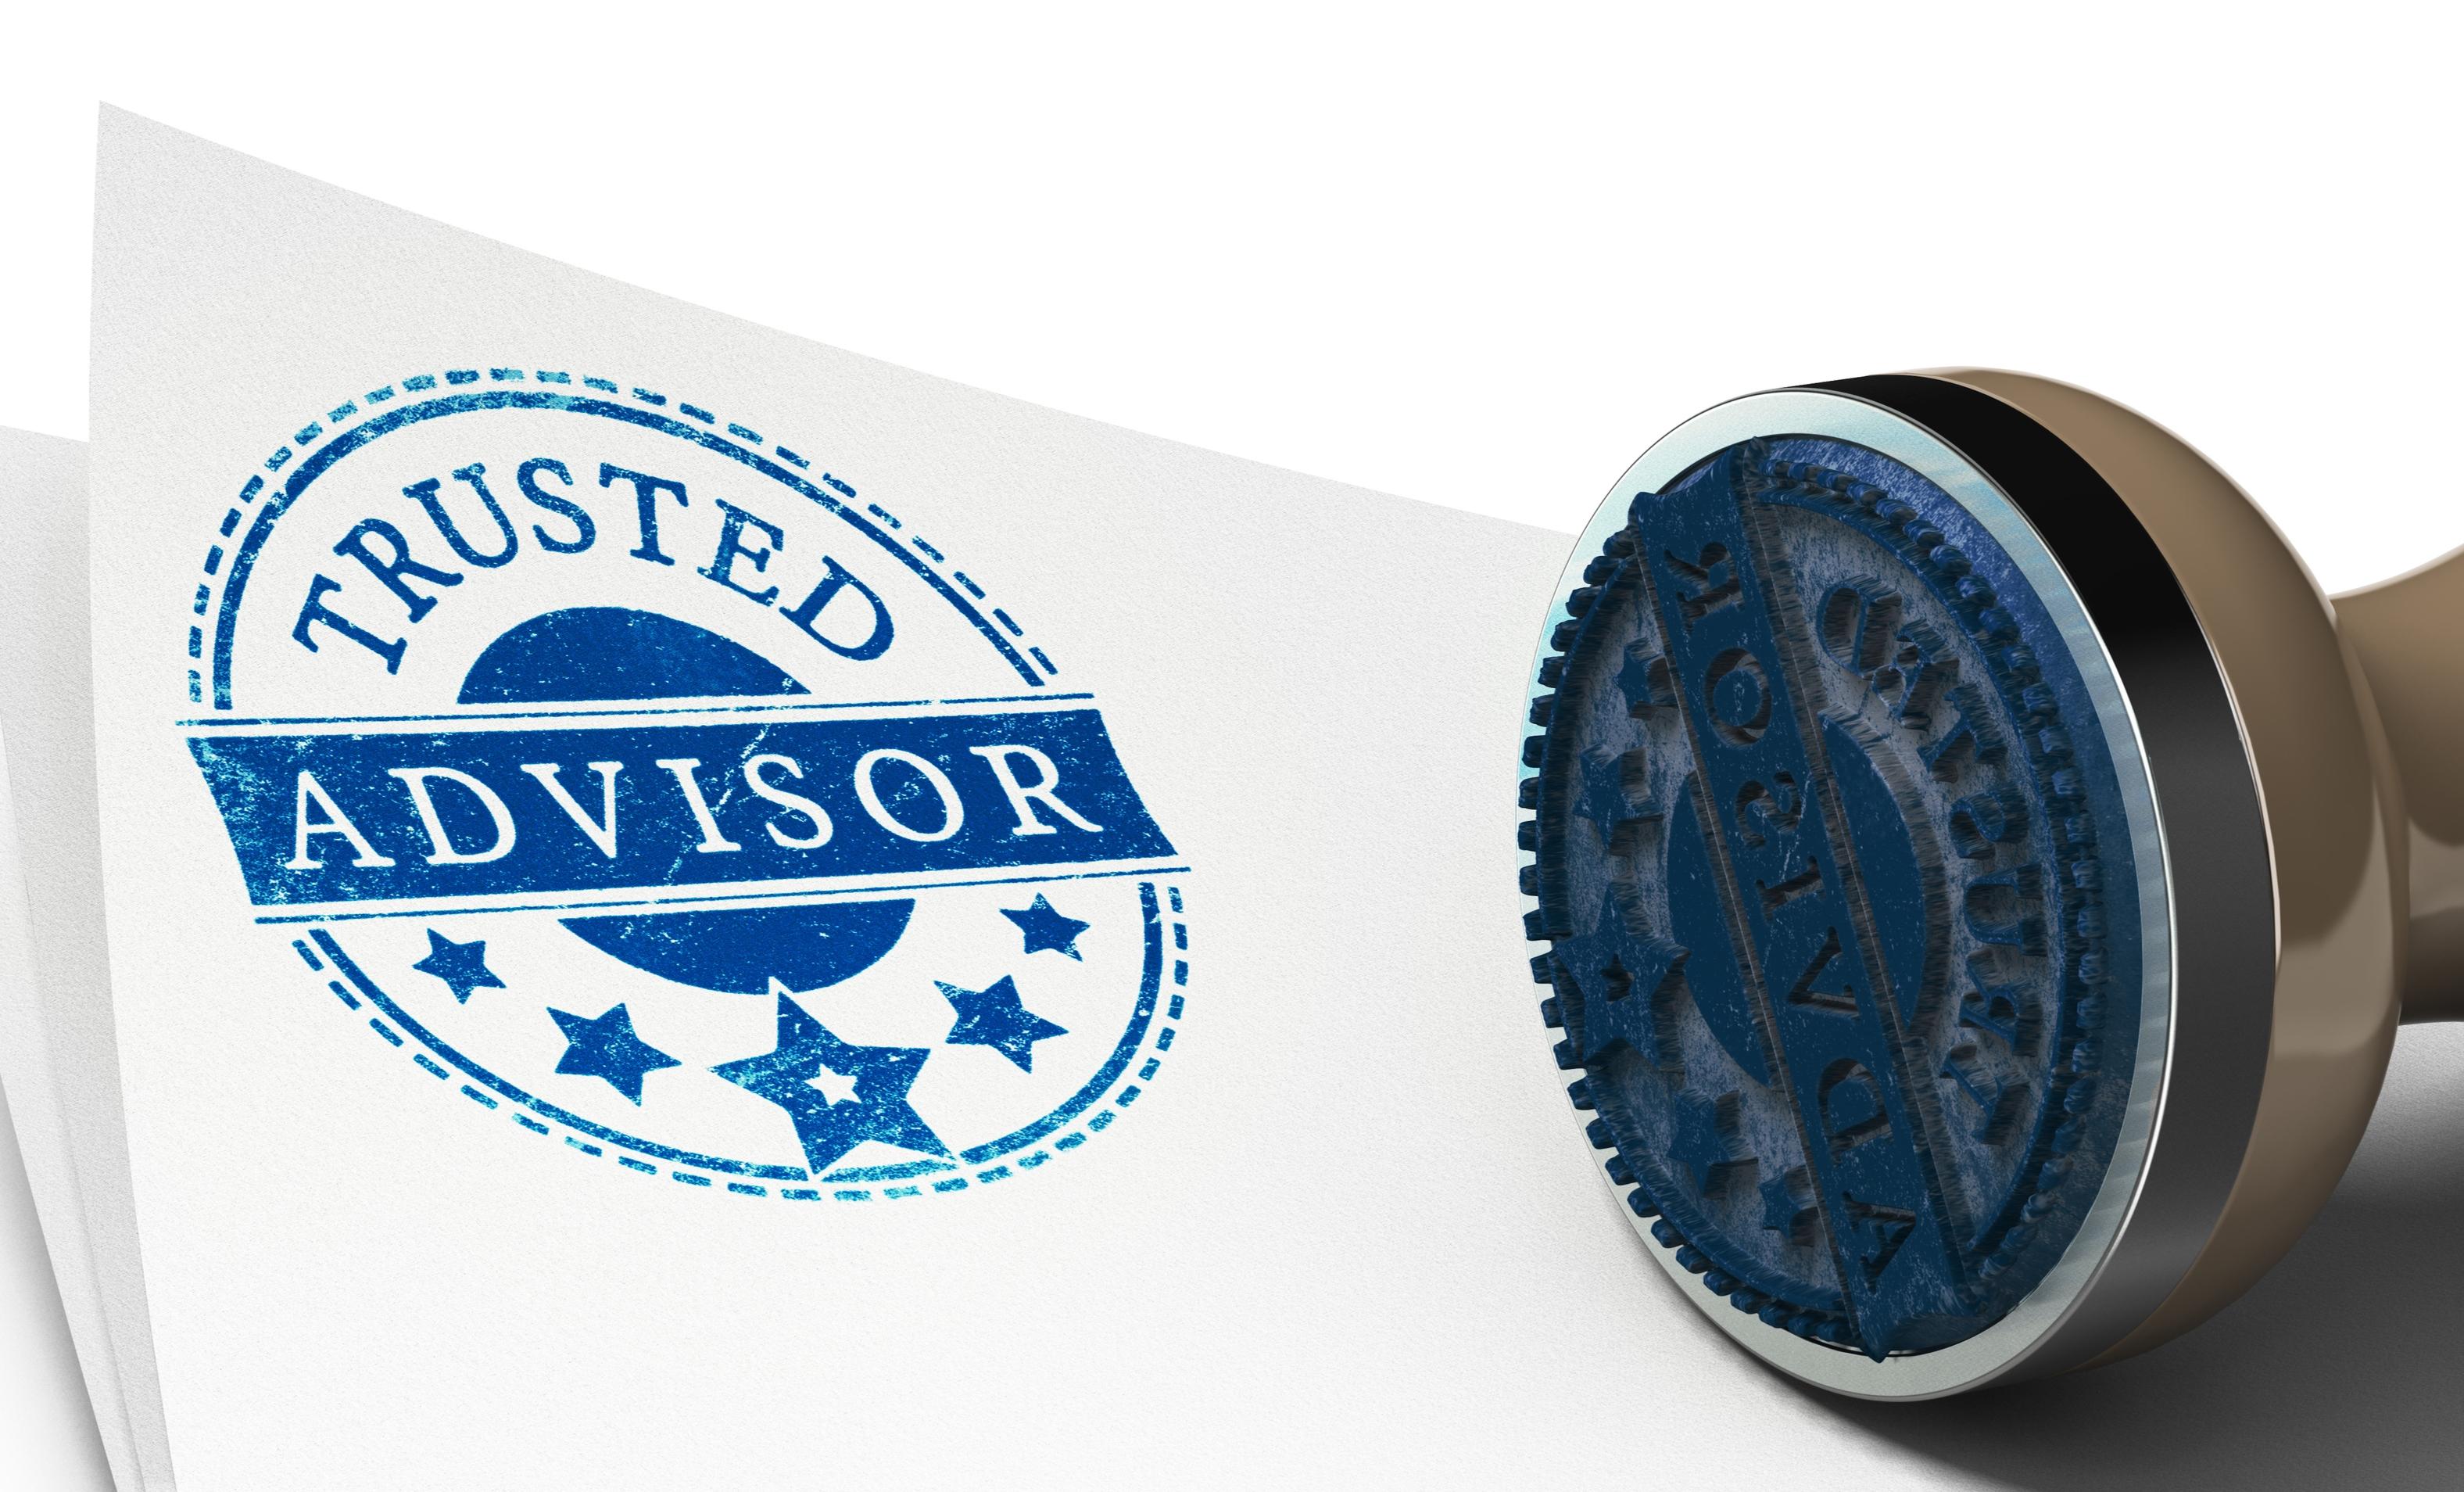 Trusted advisor crop shutterstock_387420433